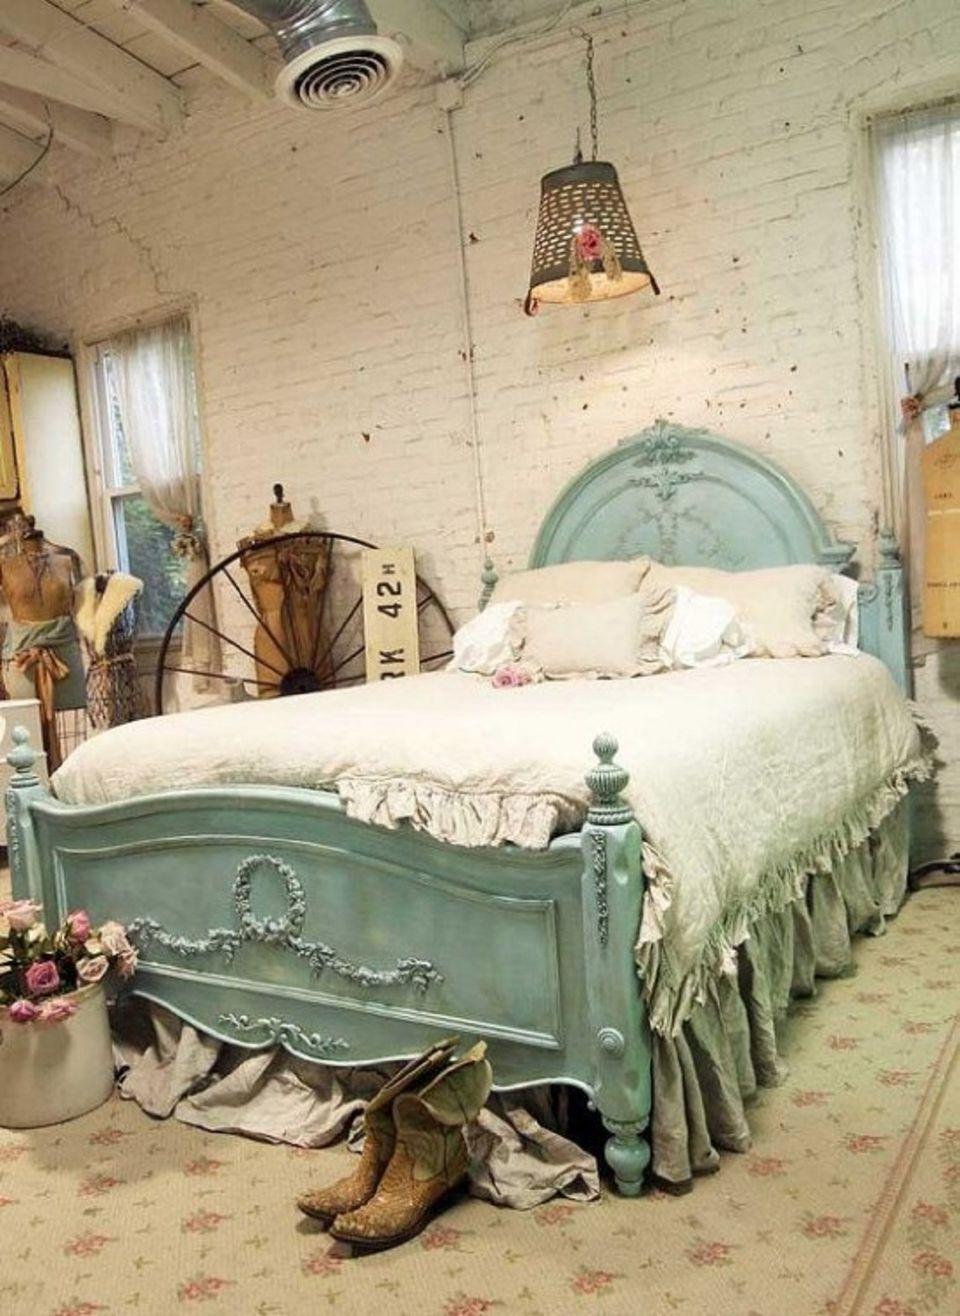 Vintage Concept for bedroom interior